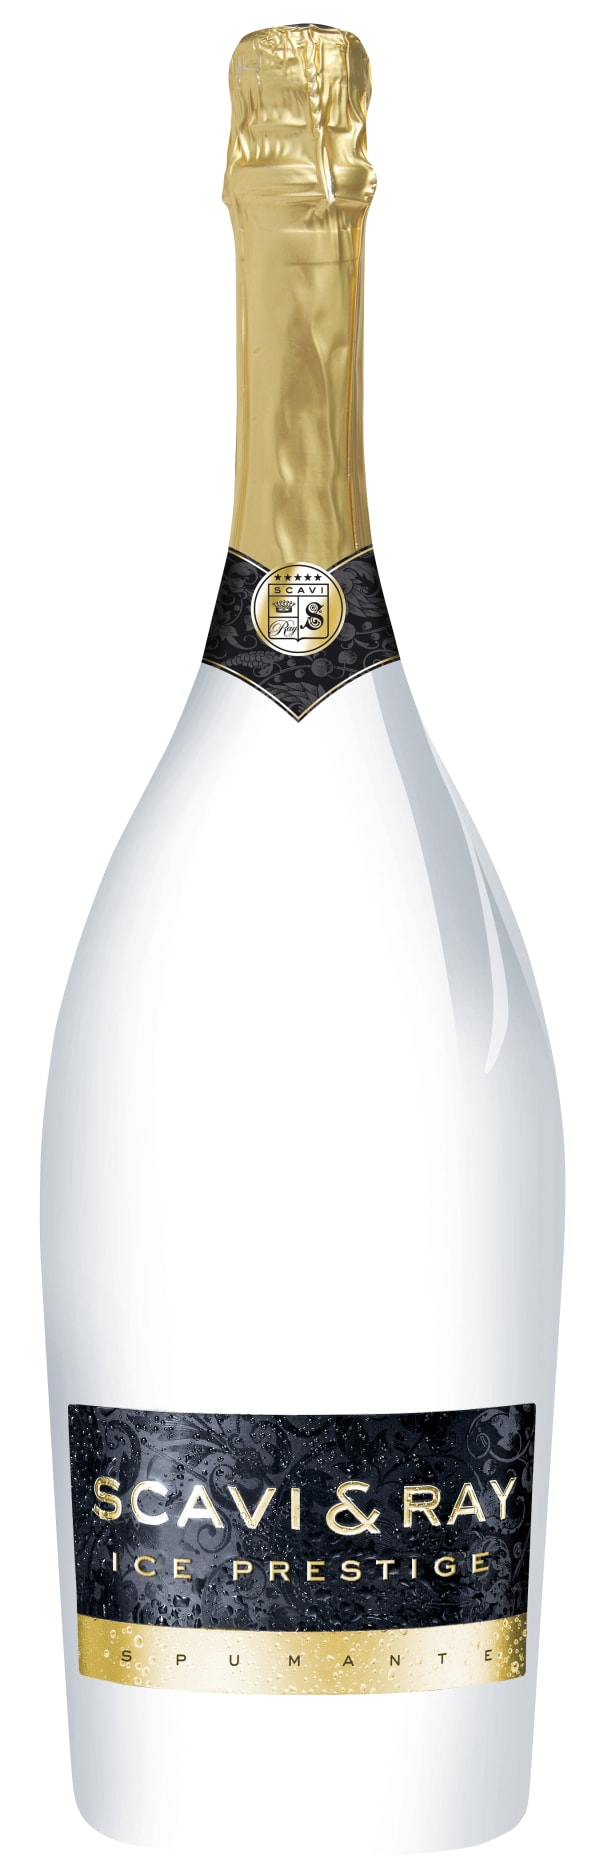 Scavi & Ray Ice Prestige Medium Dry